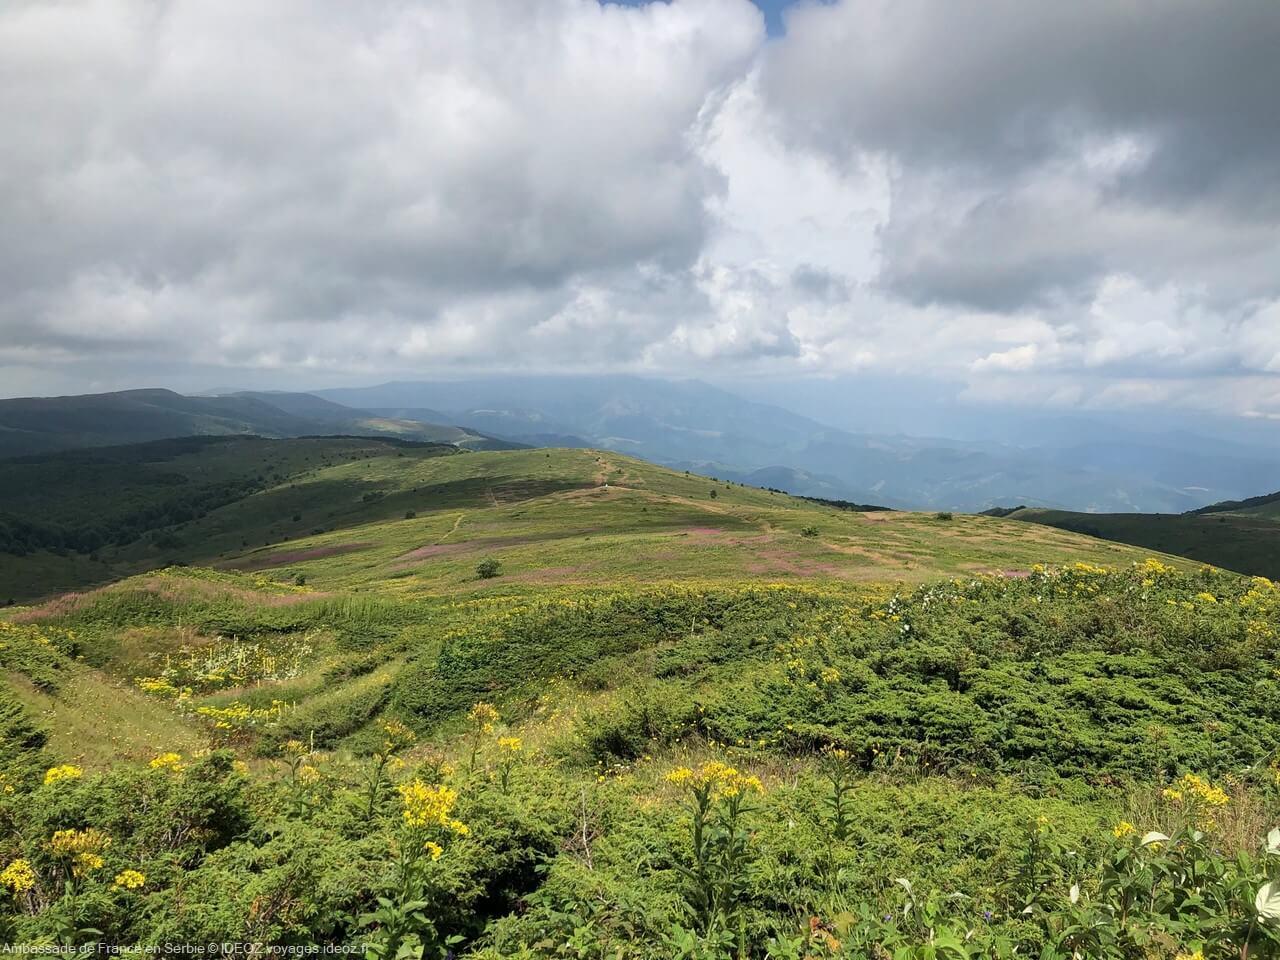 Randonnée à Stara Planina, sur la via dinarica voie verte en Serbie 5